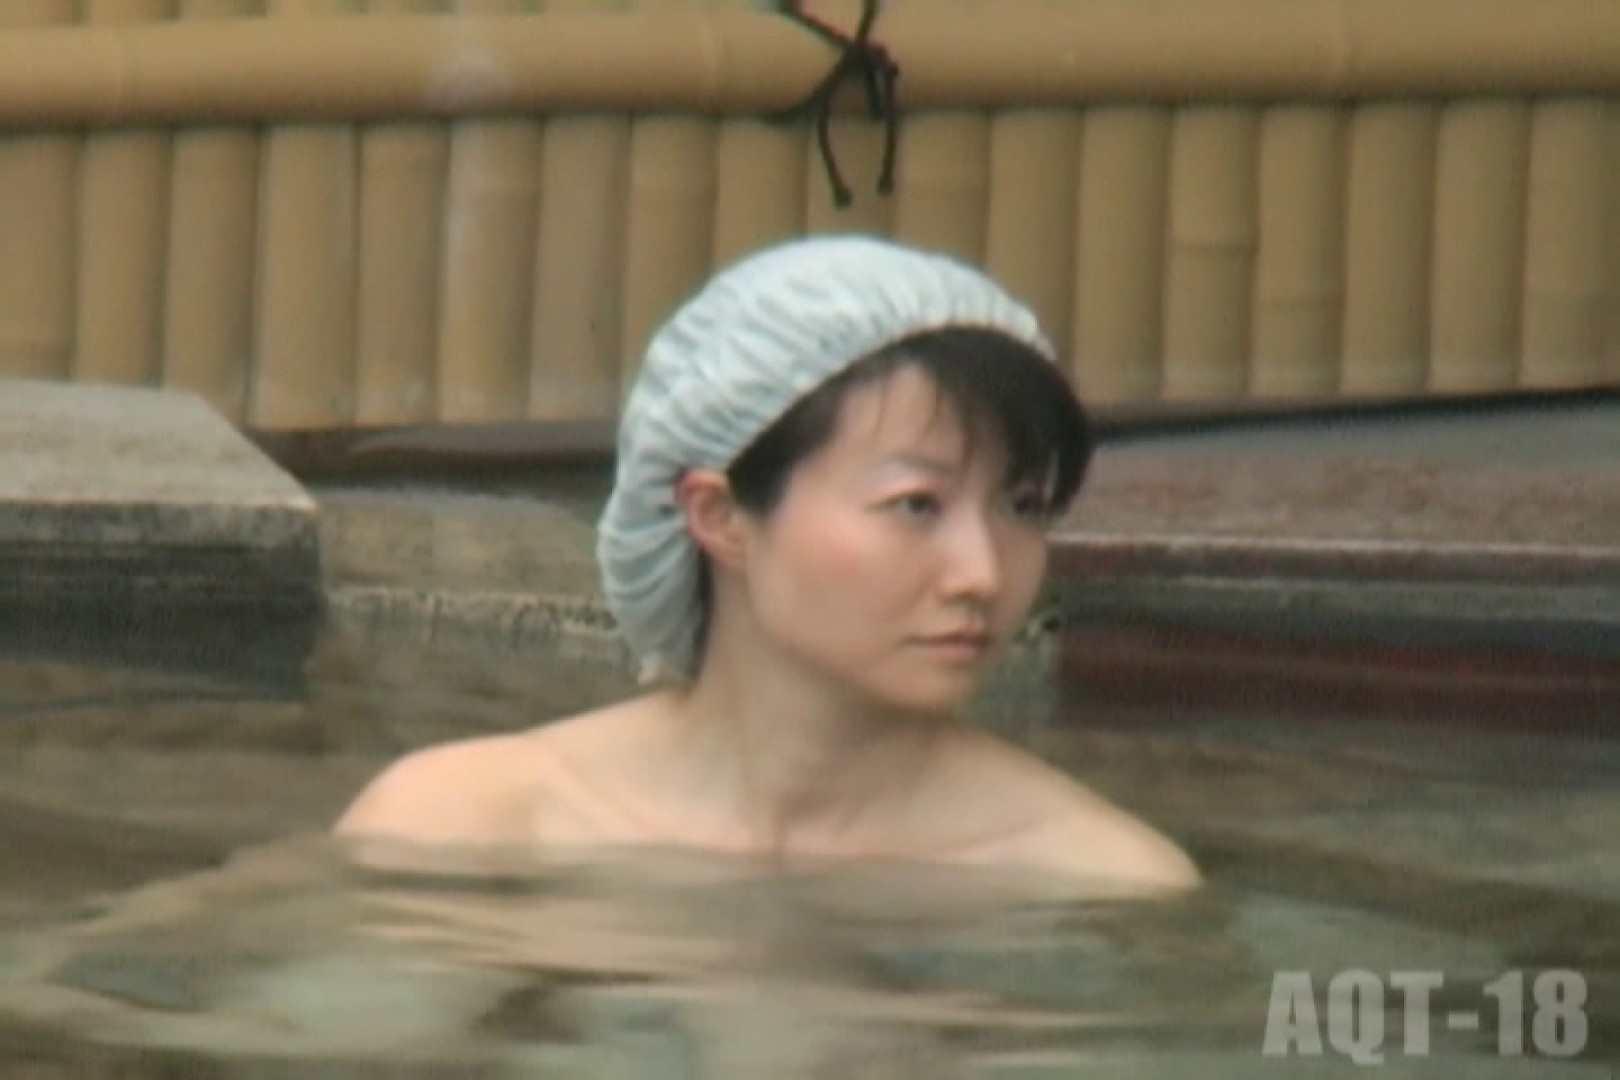 Aquaな露天風呂Vol.864 盗撮 のぞき動画画像 68画像 38